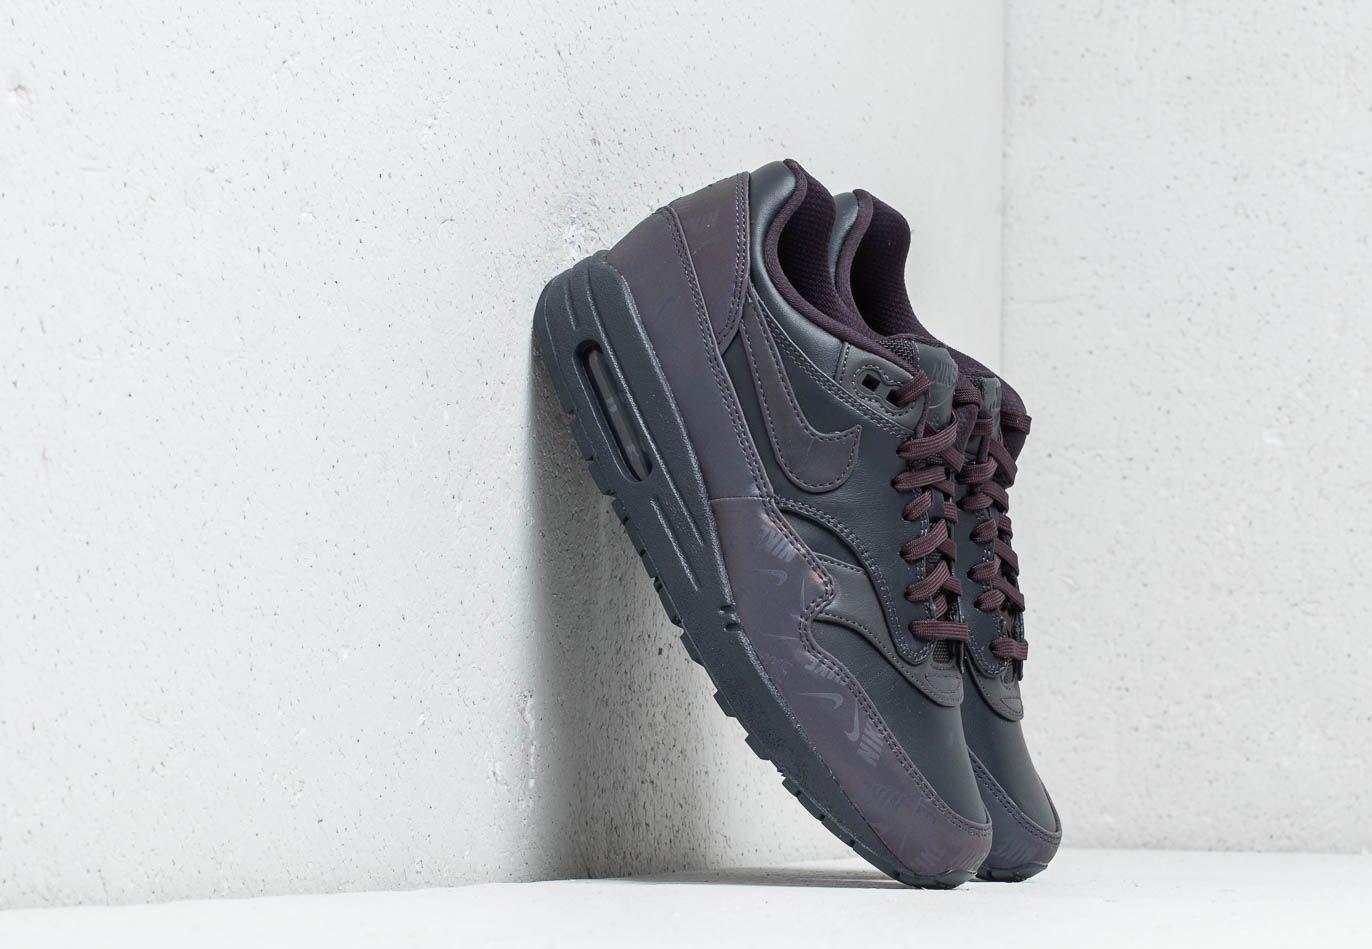 89370f639e Nike Wmns Air Max 1 Lx Oil Grey/ Oil Grey-oil Grey in Gray - Lyst